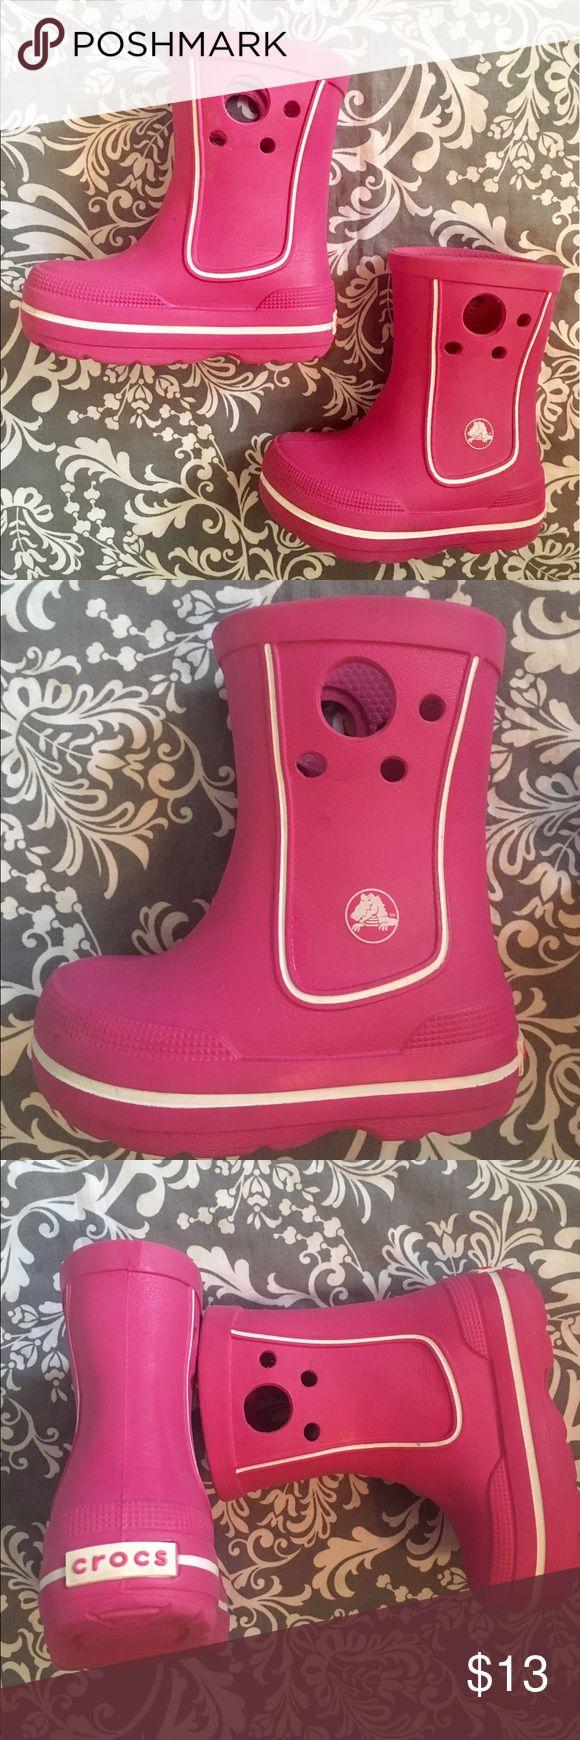 Pink Crocs Boots! Toddler Size 6/7 Adorable Crocs!! Pink Boots, Toddler Size 6/7, Excellent condition CROCS Shoes Boots